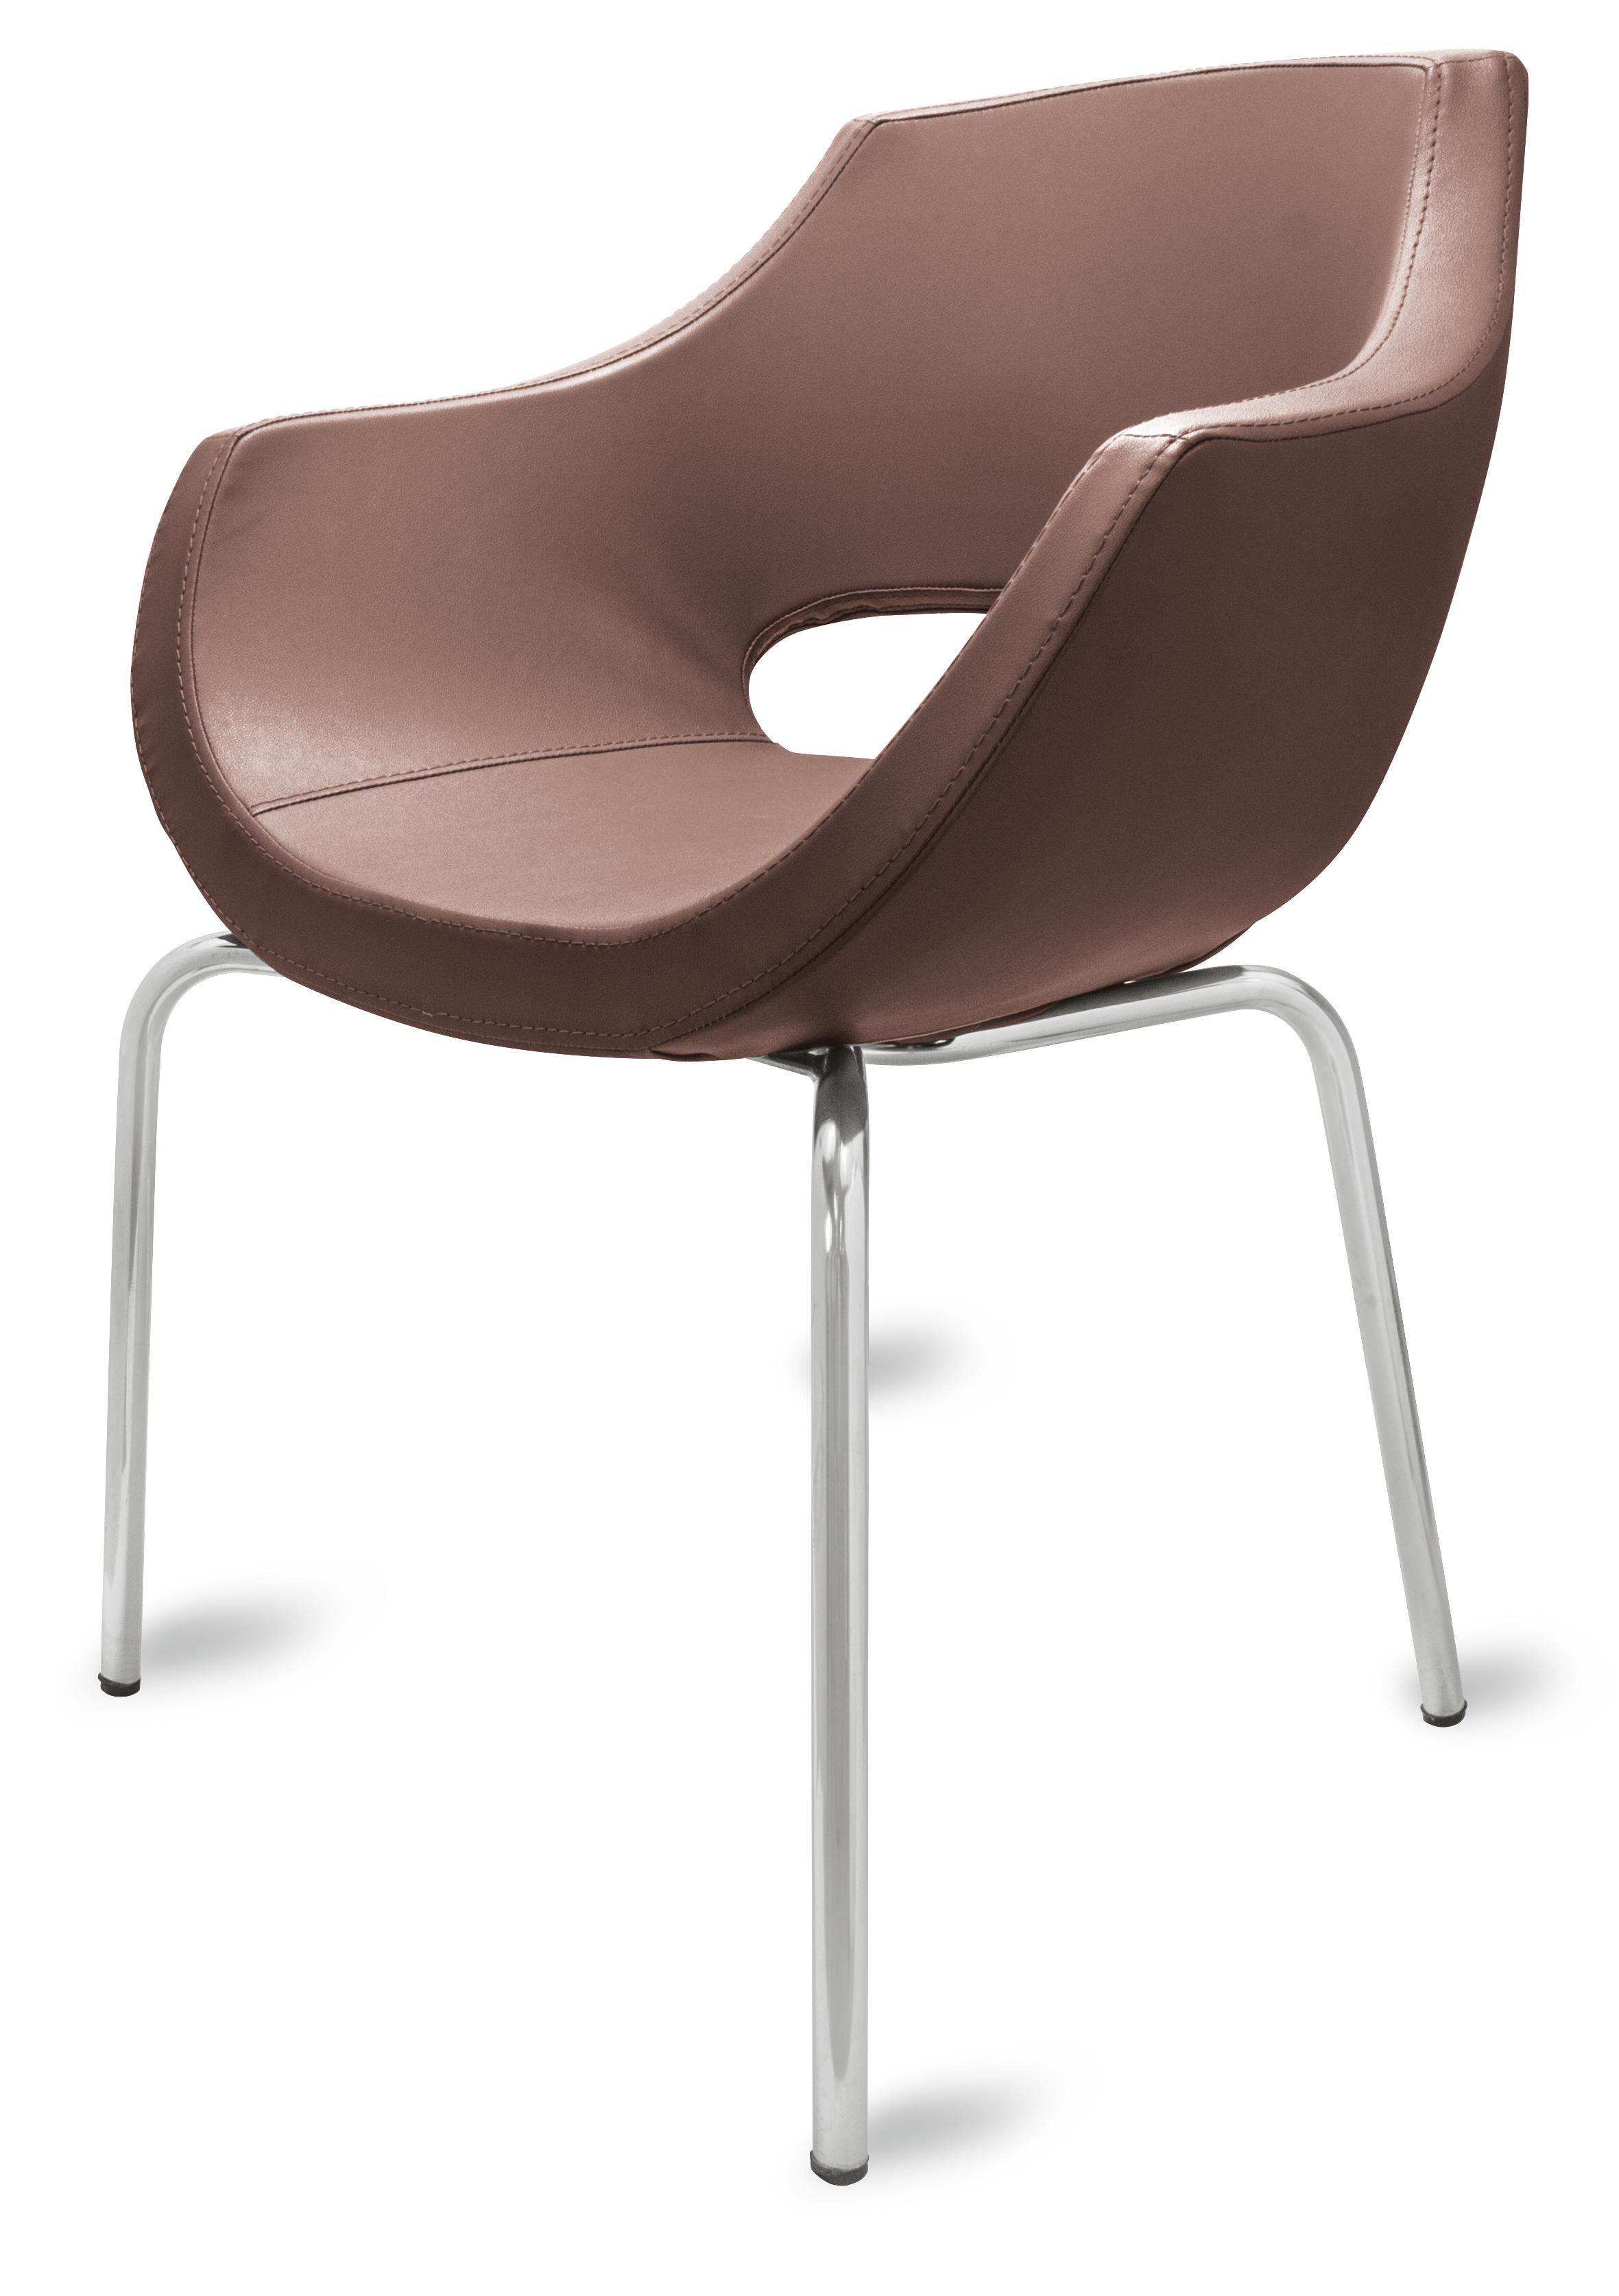 gastro stuhl lea braun g nstig kaufen m bel star. Black Bedroom Furniture Sets. Home Design Ideas